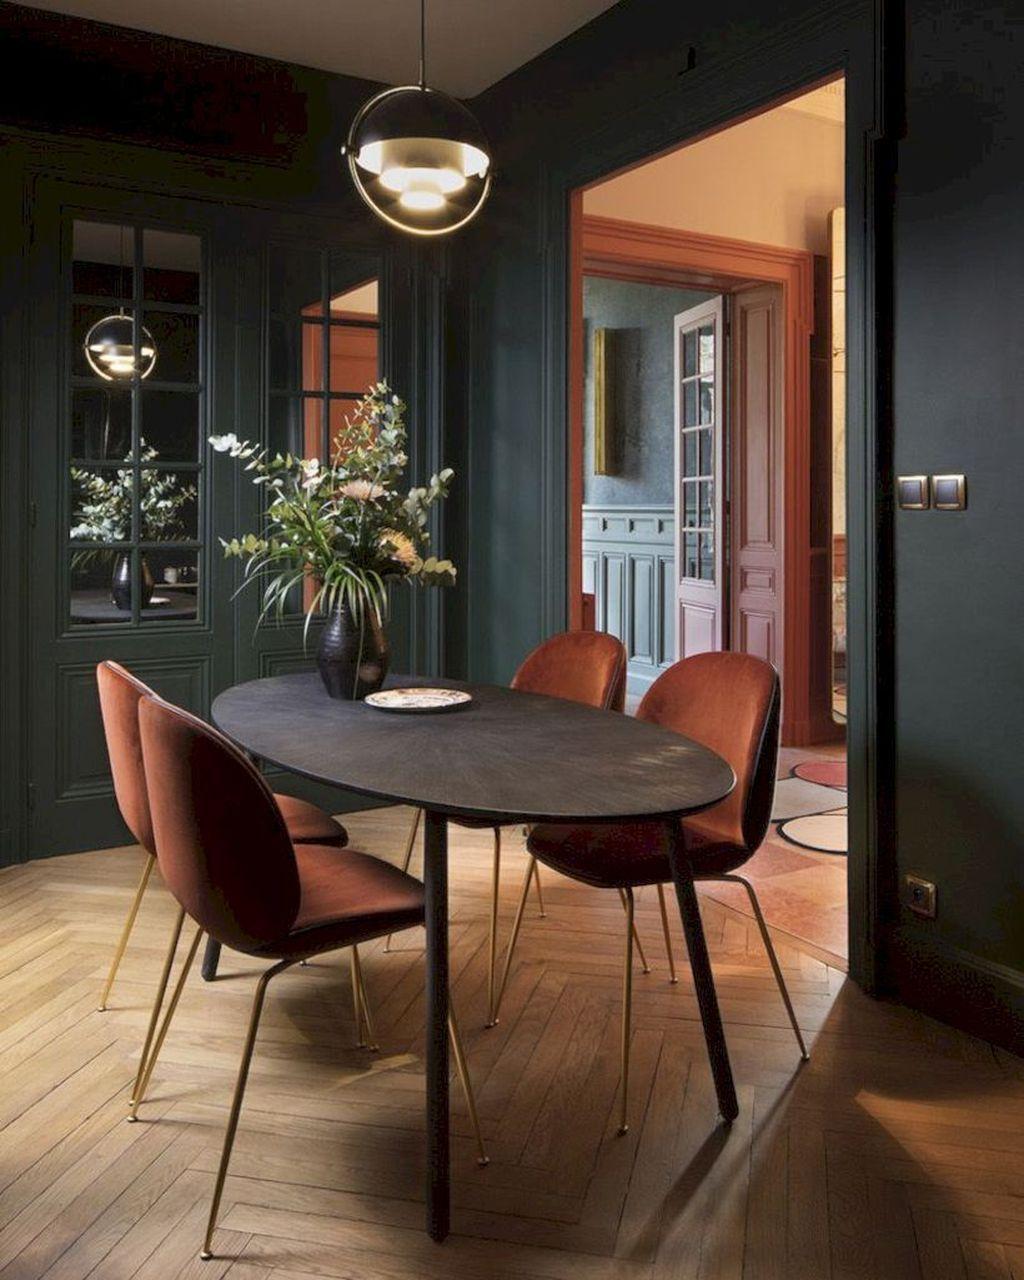 32 Admirable Dining Room Design Ideas Pimphomee Luxury Dining Room Dining Room Design Stylish Dining Room